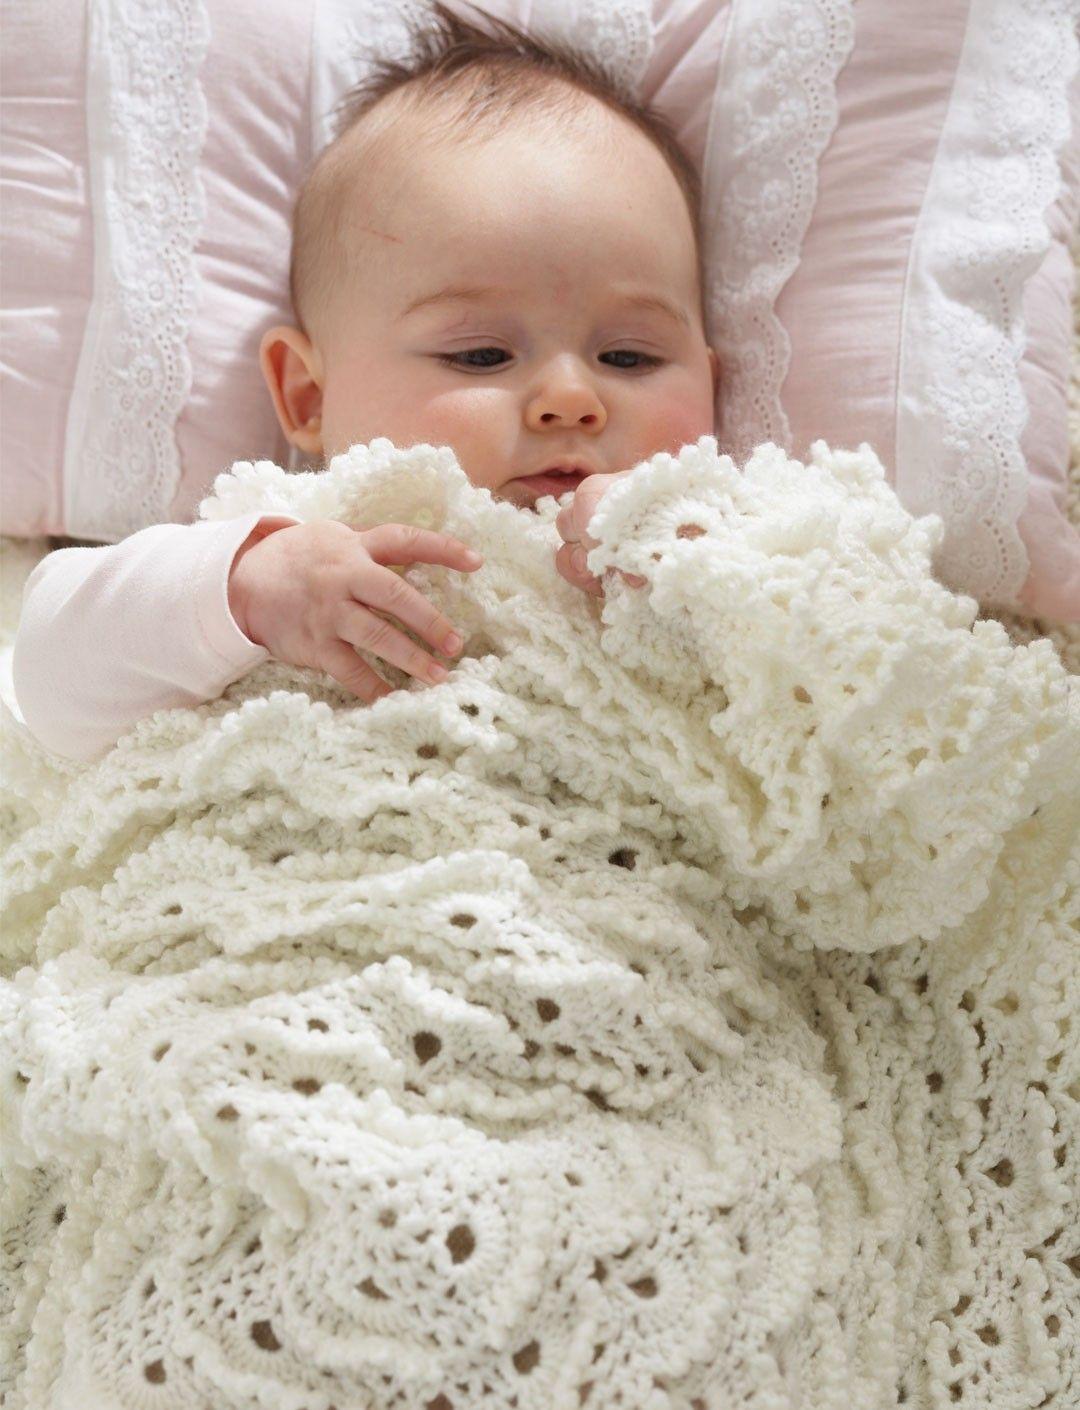 Yarnspirations patons fluffy meringue blanket free crochet yarnspirations patons fluffy meringue blanket free crochet pattern yarnspirations bankloansurffo Gallery